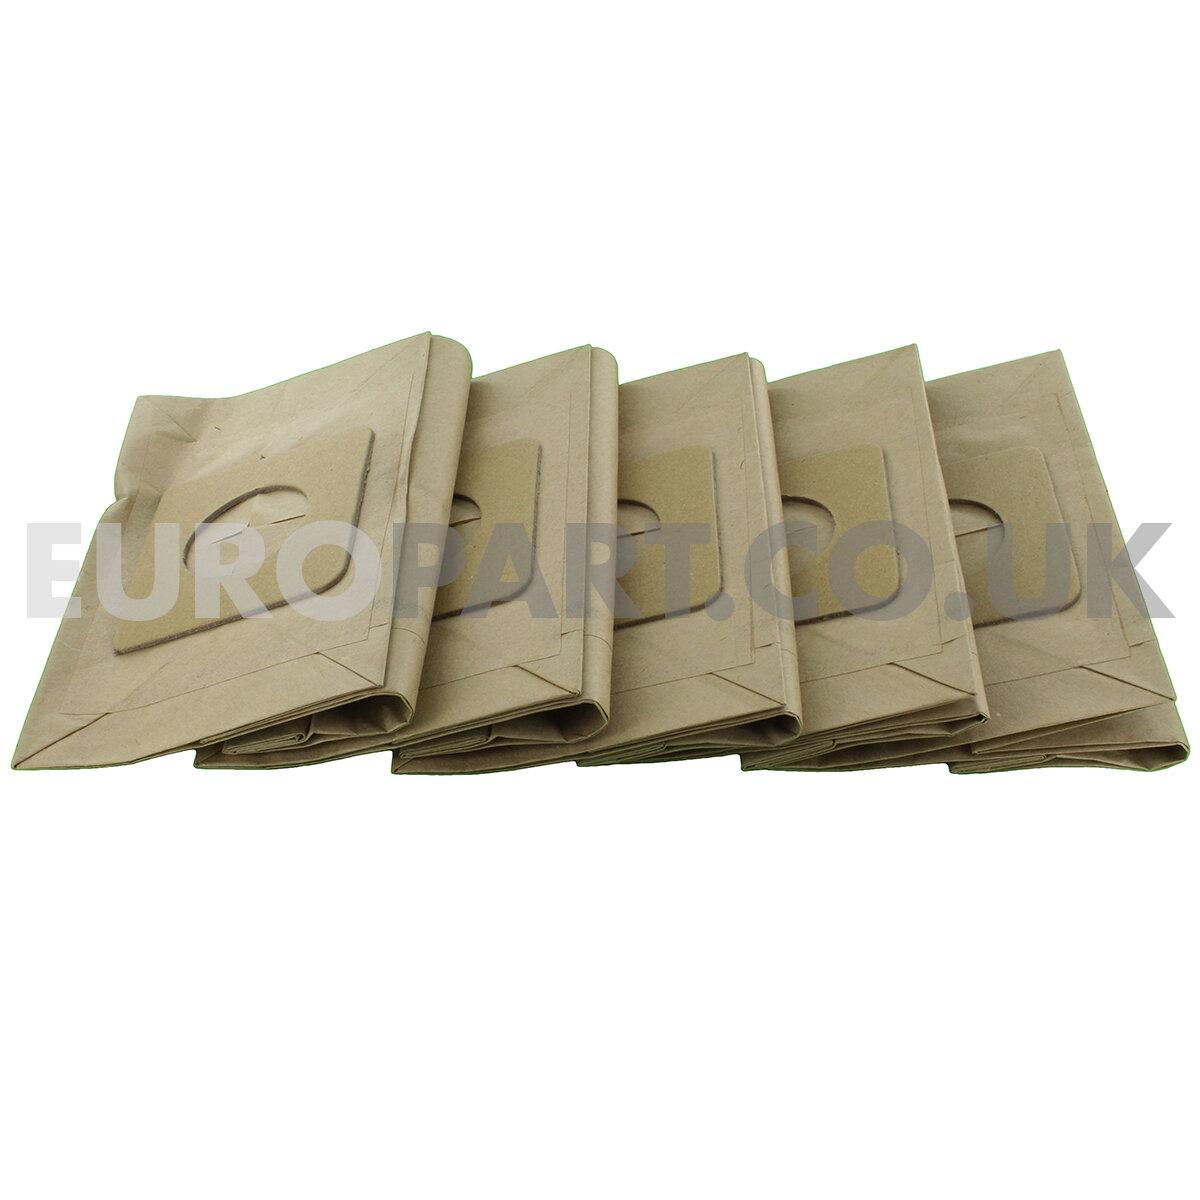 Lg V3300, Tesco Vc108 Series Paper Bags (Pack Of 5)